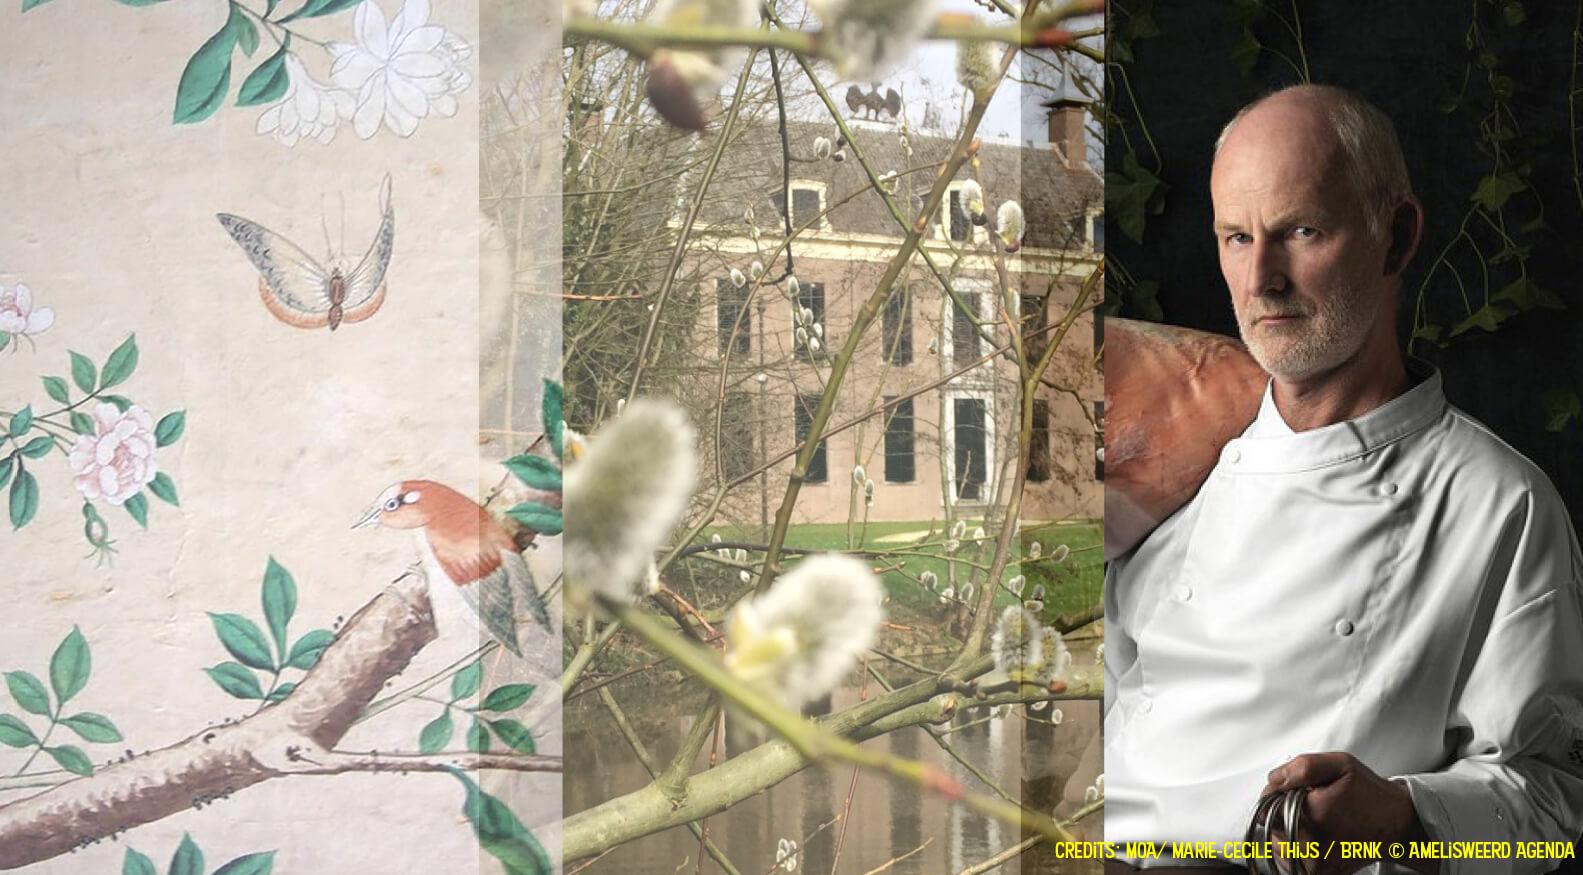 MOA cafe Arjan Smit Pronckheer